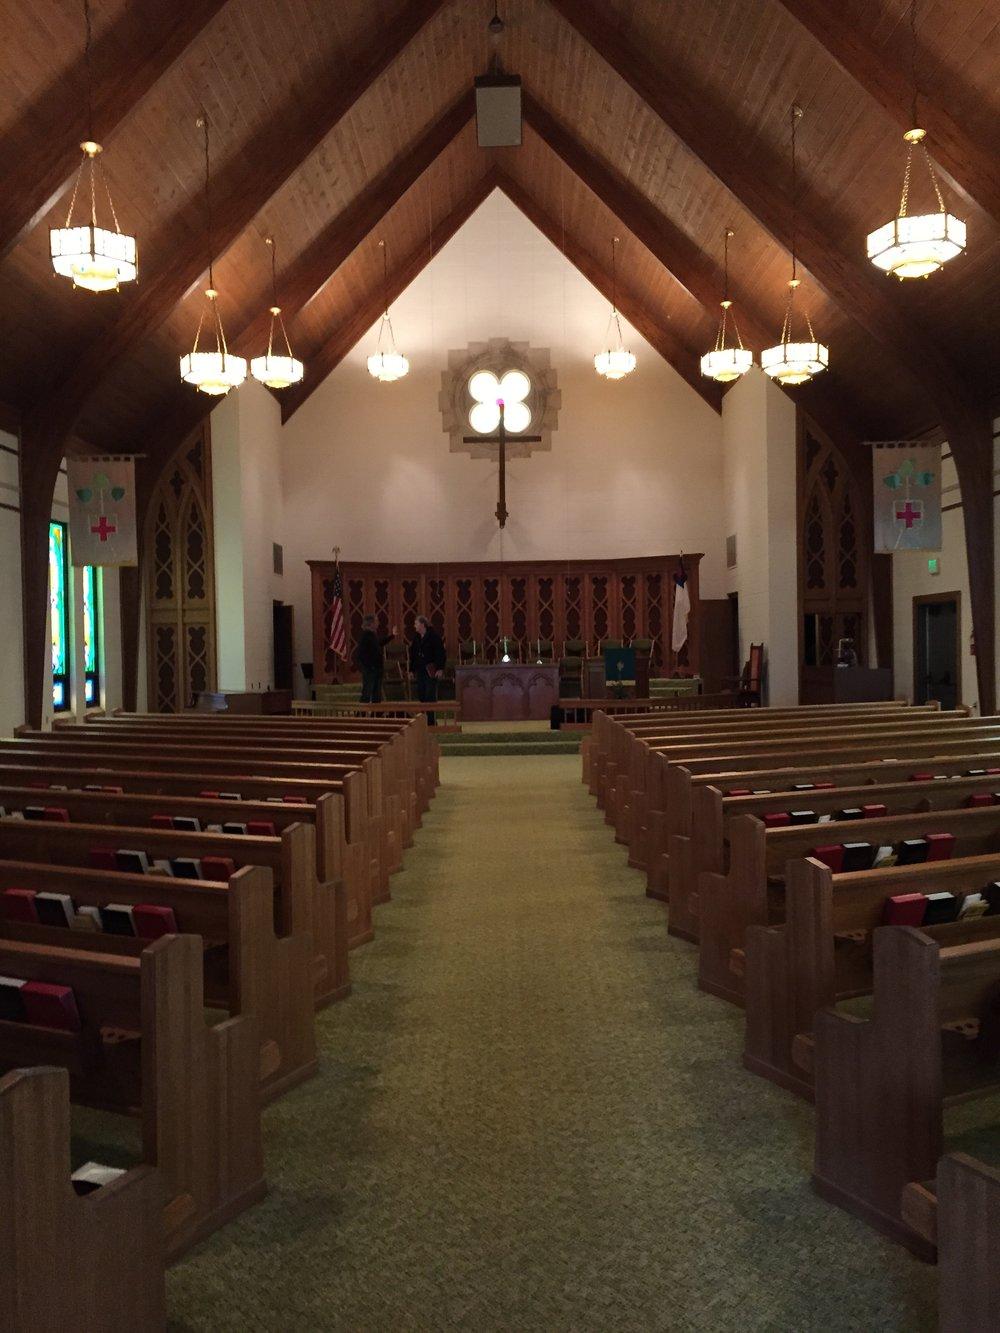 Shilo United Methodist Church - Before